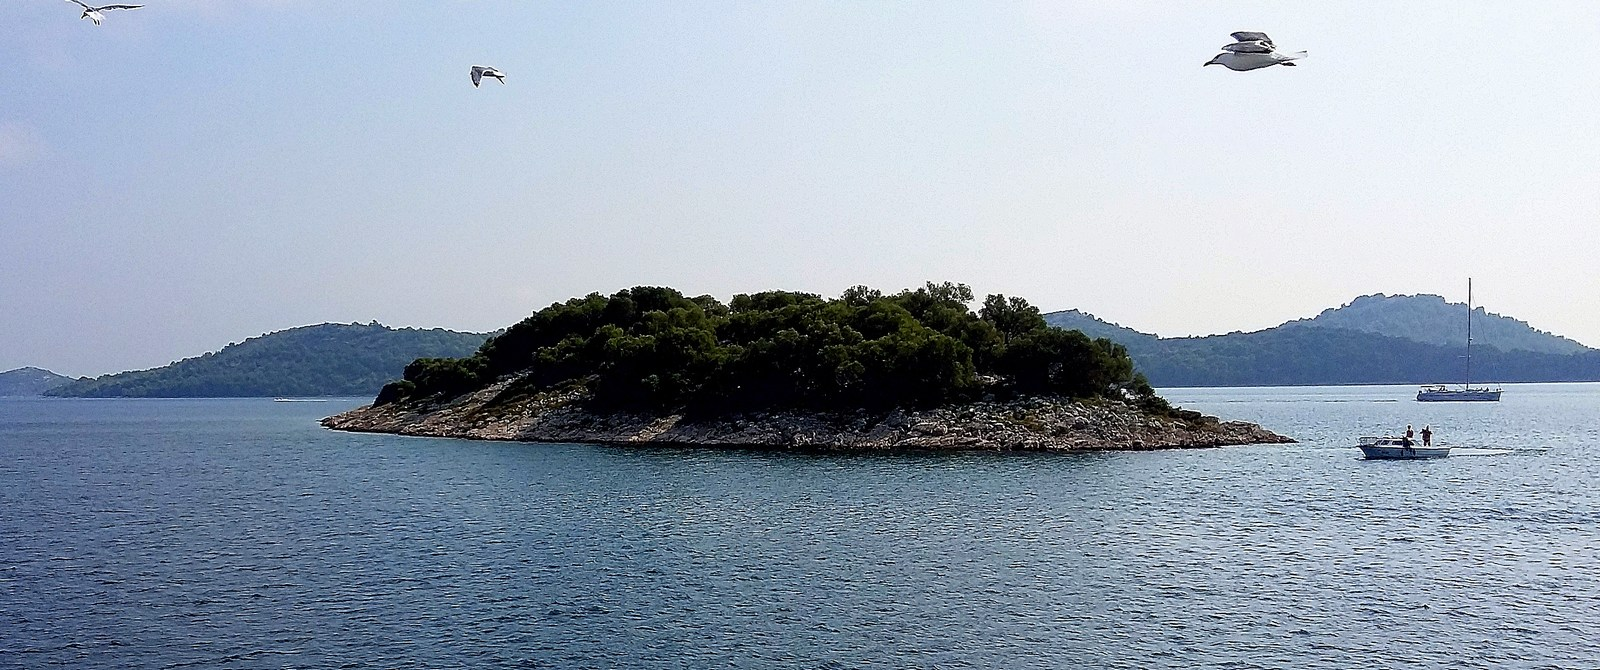 Otok, pogled iz Vodic